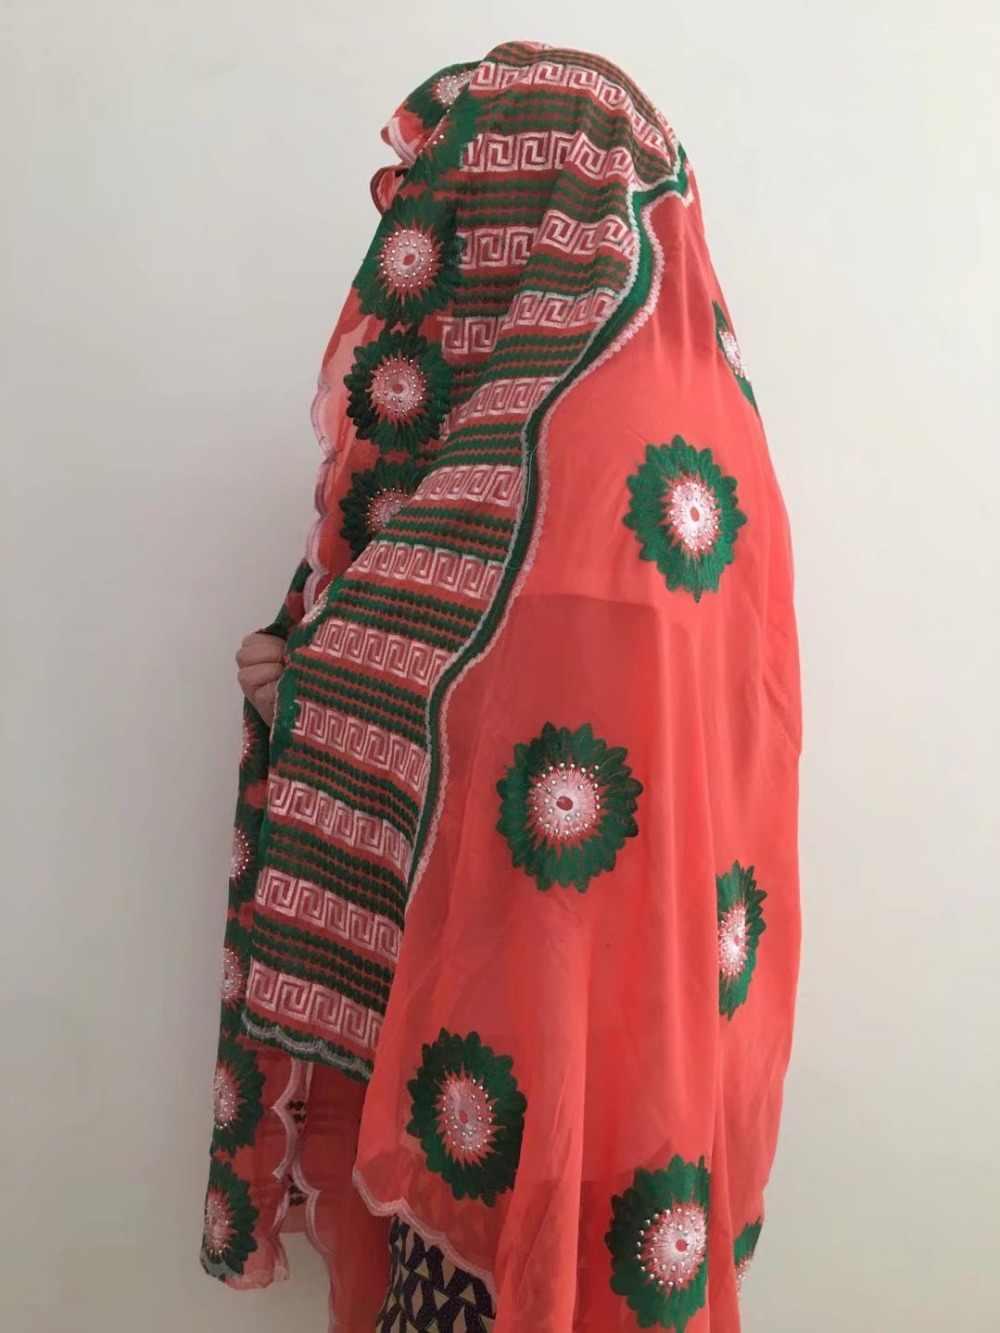 Headties הניגרי gele ראש כורכת נשים צעיף עם אפריקאית אבנים שיפון טול תחרה סיטונאי לנשים 3 יחידות\חבילה JFX-18